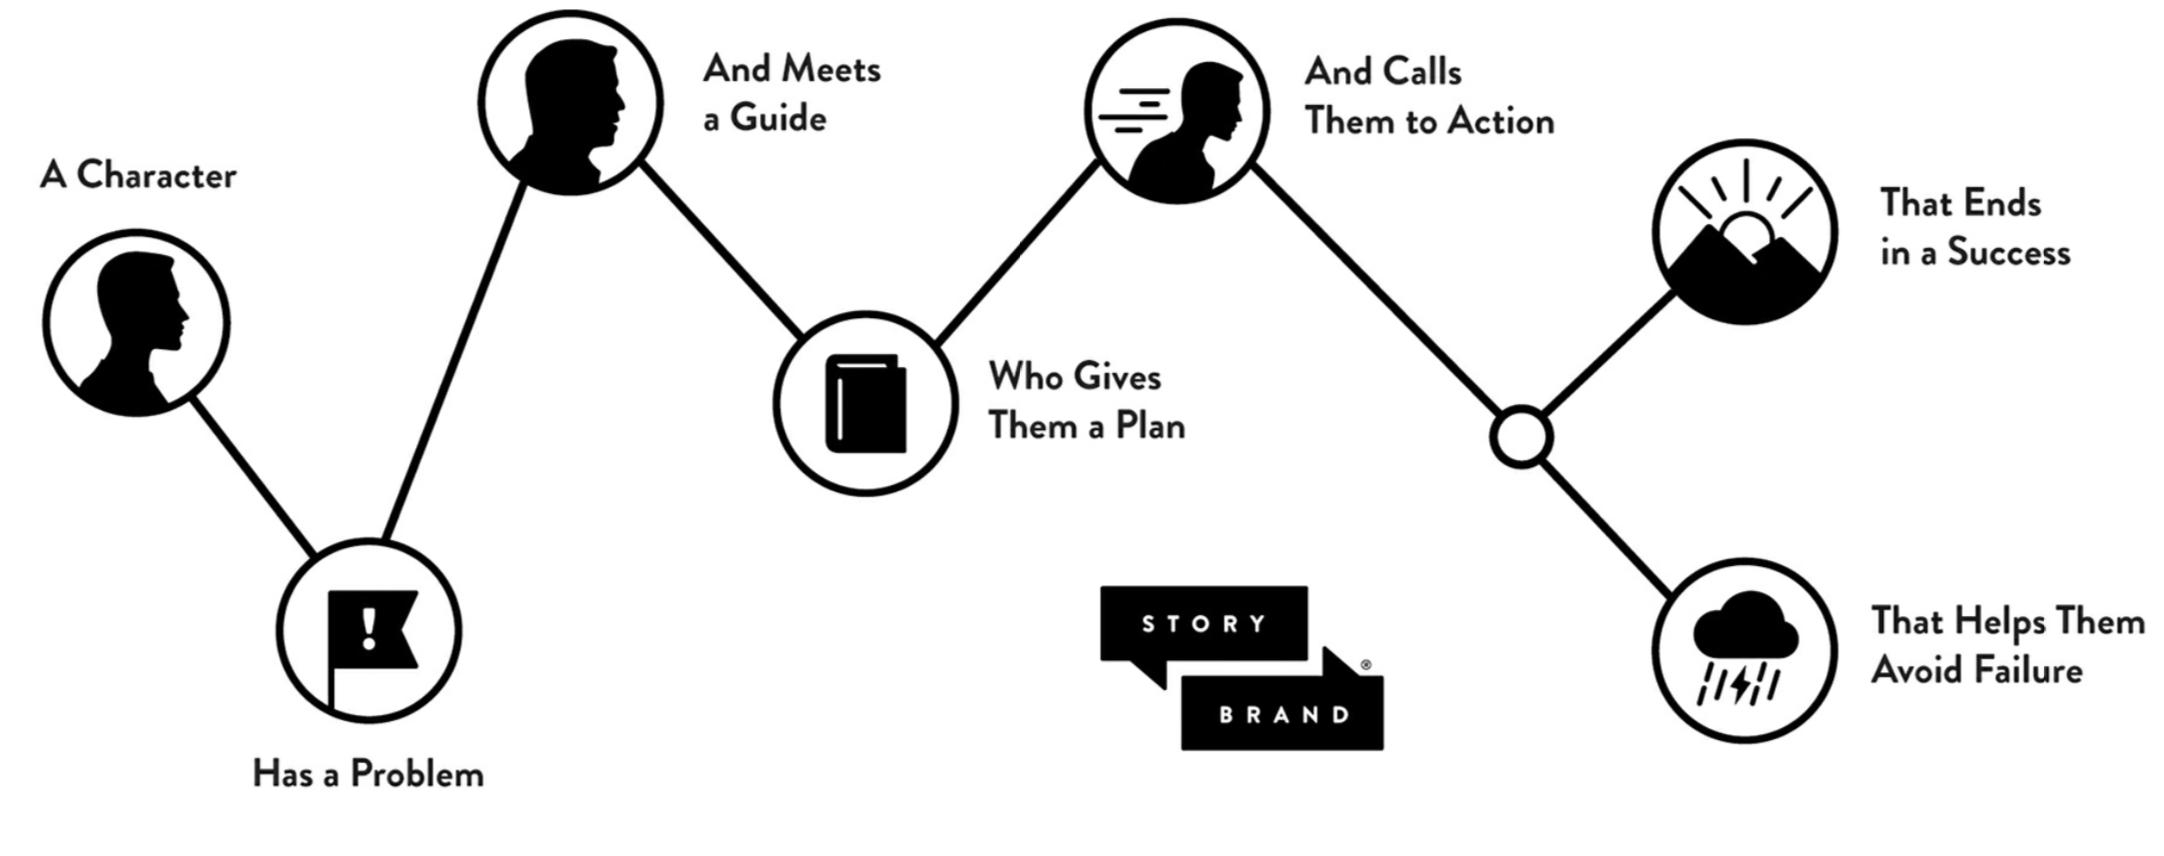 The basic structure of the StoryBrand framework